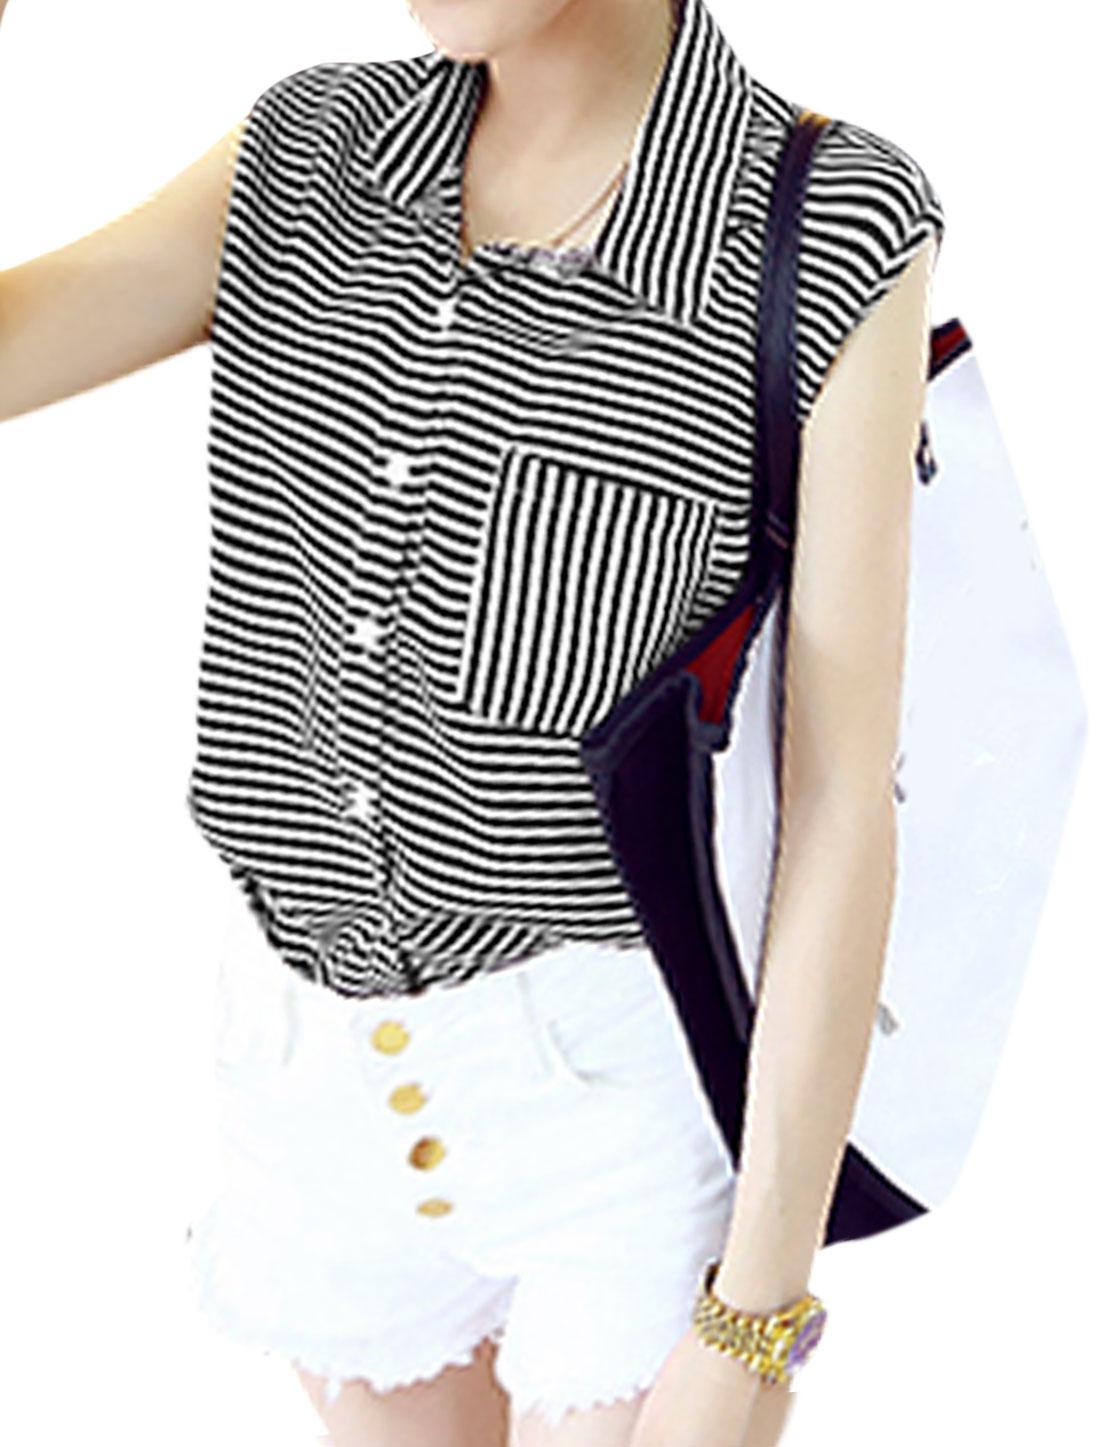 Ladies Point Collar One Pocket Button Closure Striped Shirt Black White XS